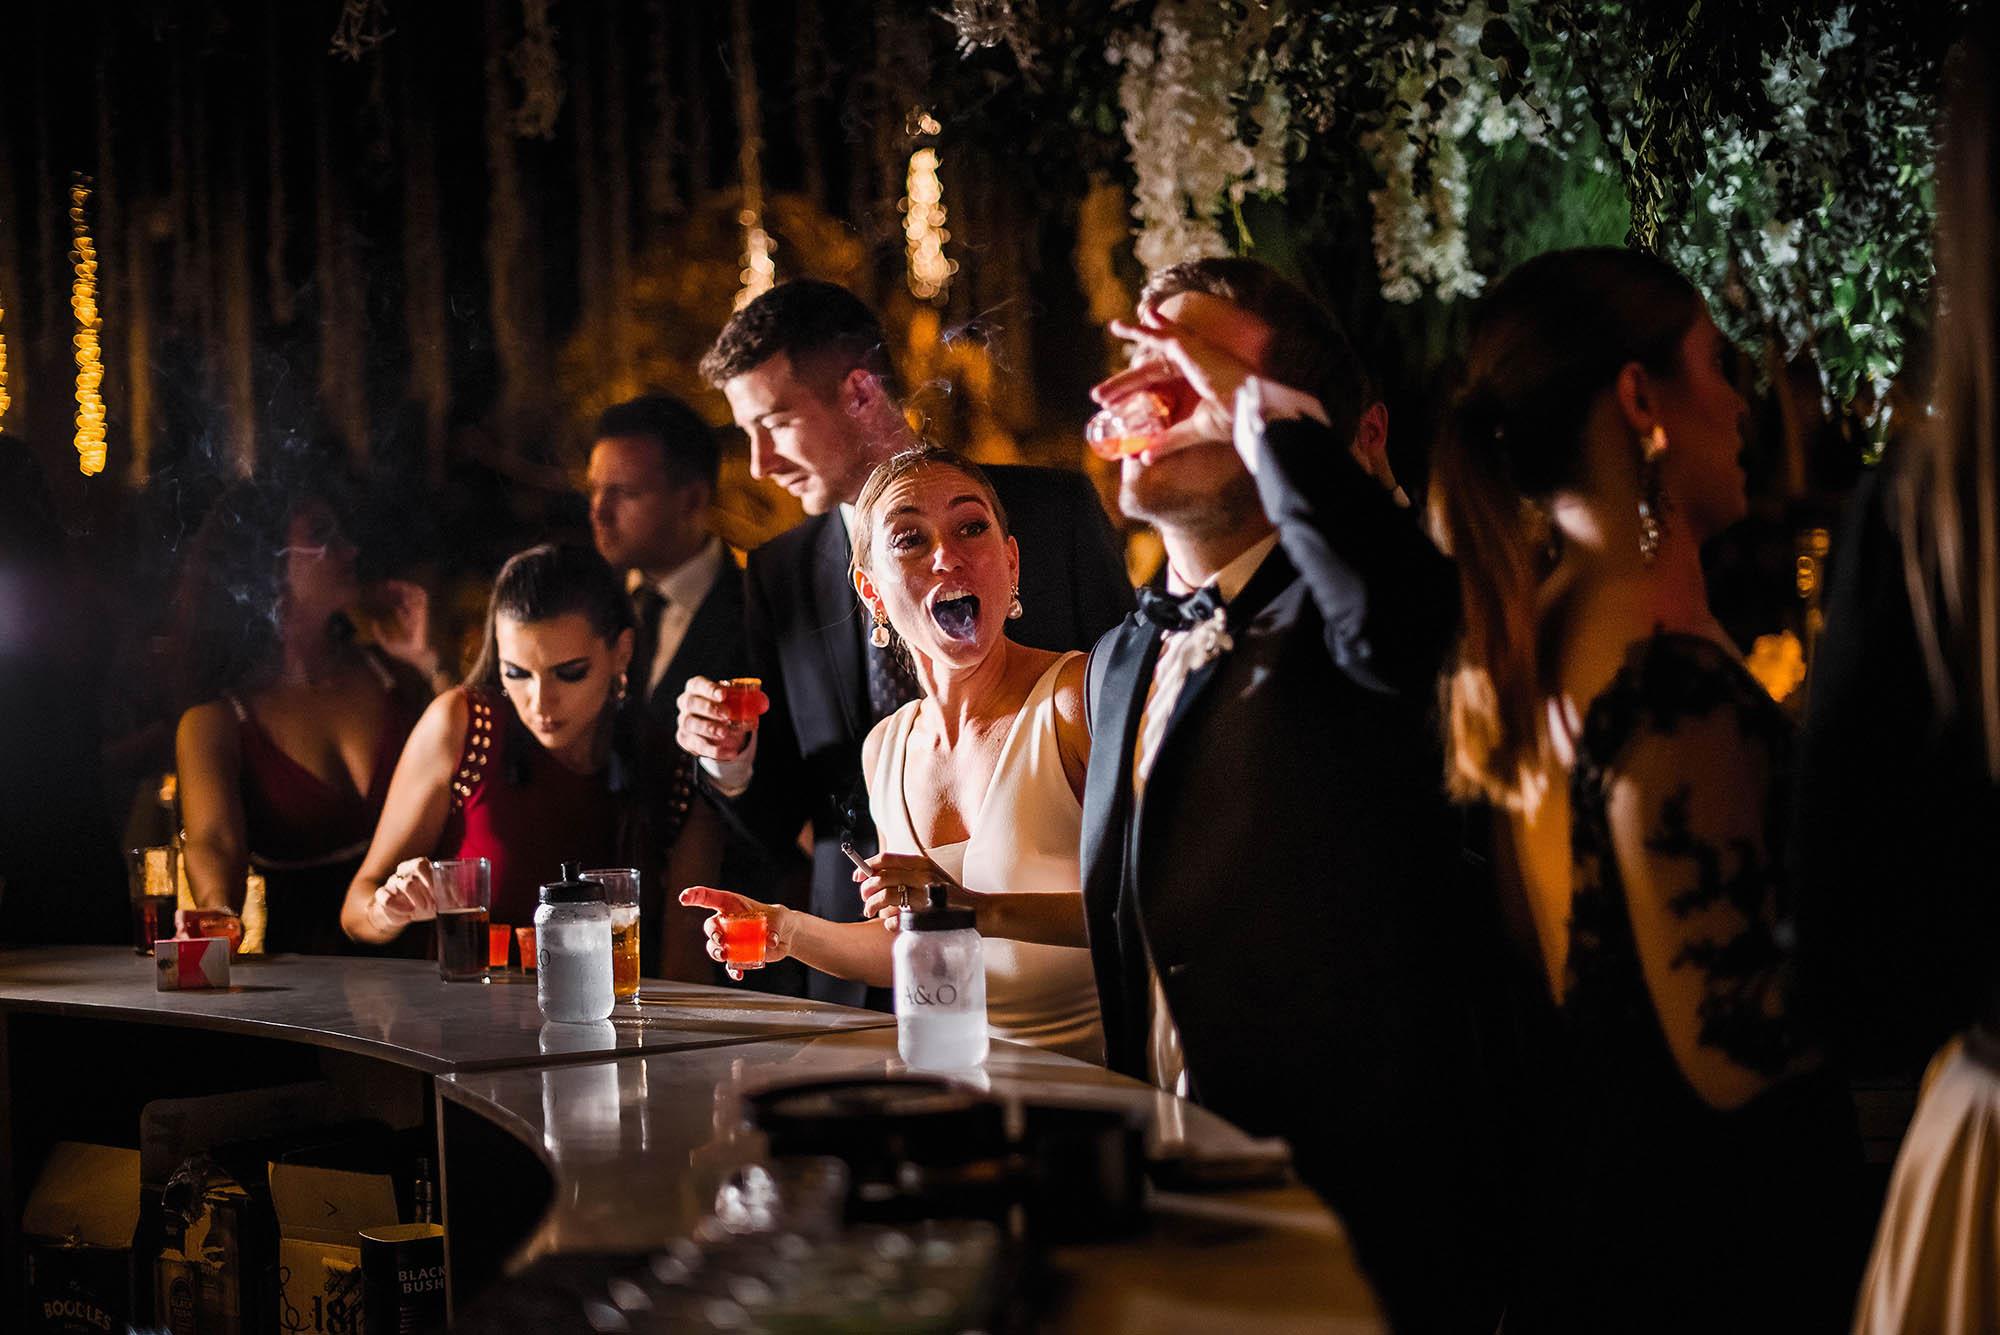 magali fotografo hacienda escoba guadalajara boda wedding 38.jpg